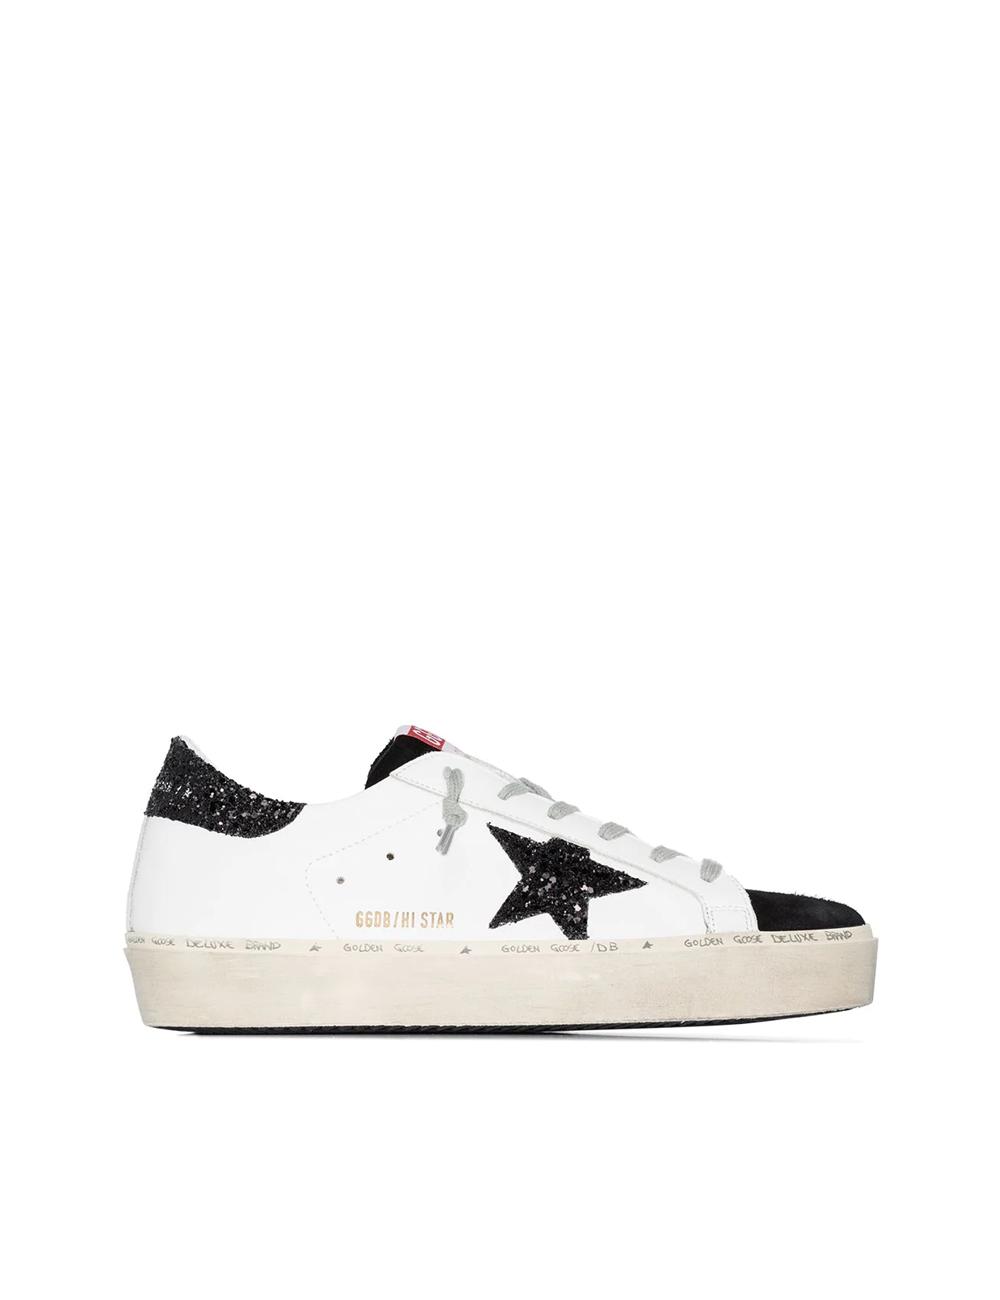 Sneakers Hi Star Golden Goose - BIG BOSS MEGEVE